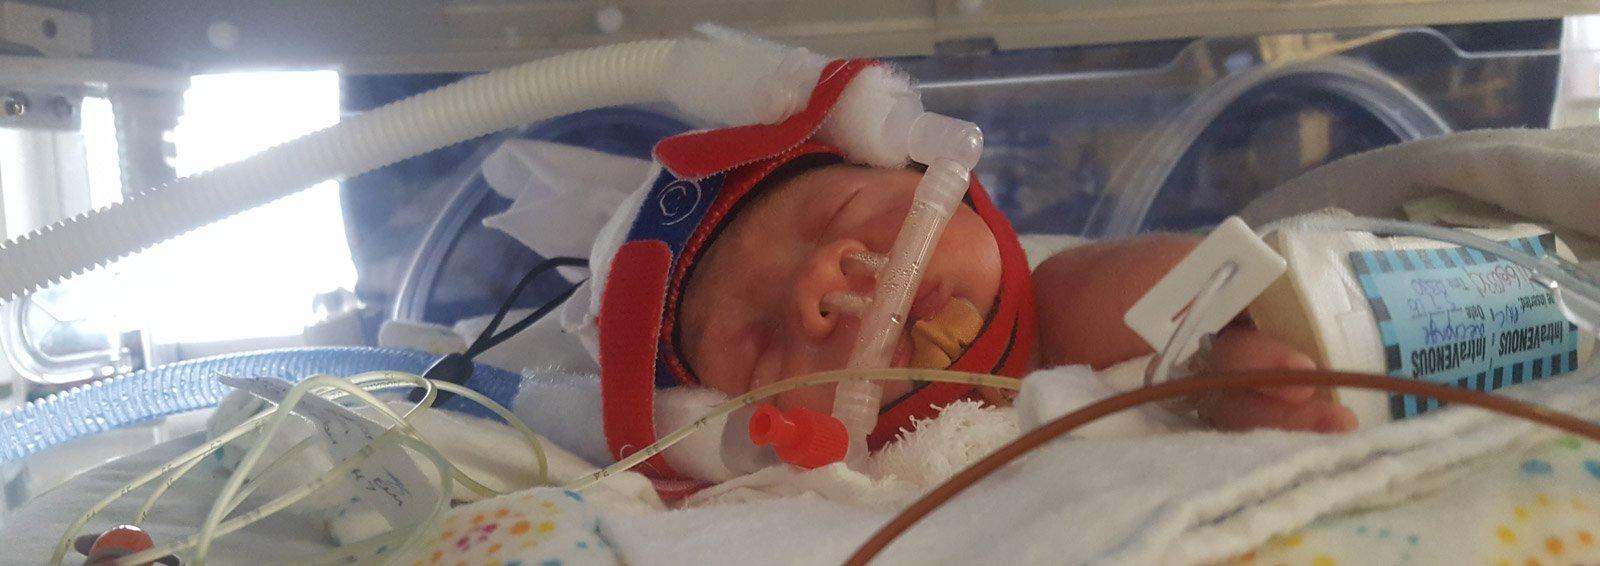 Having a Premature Baby